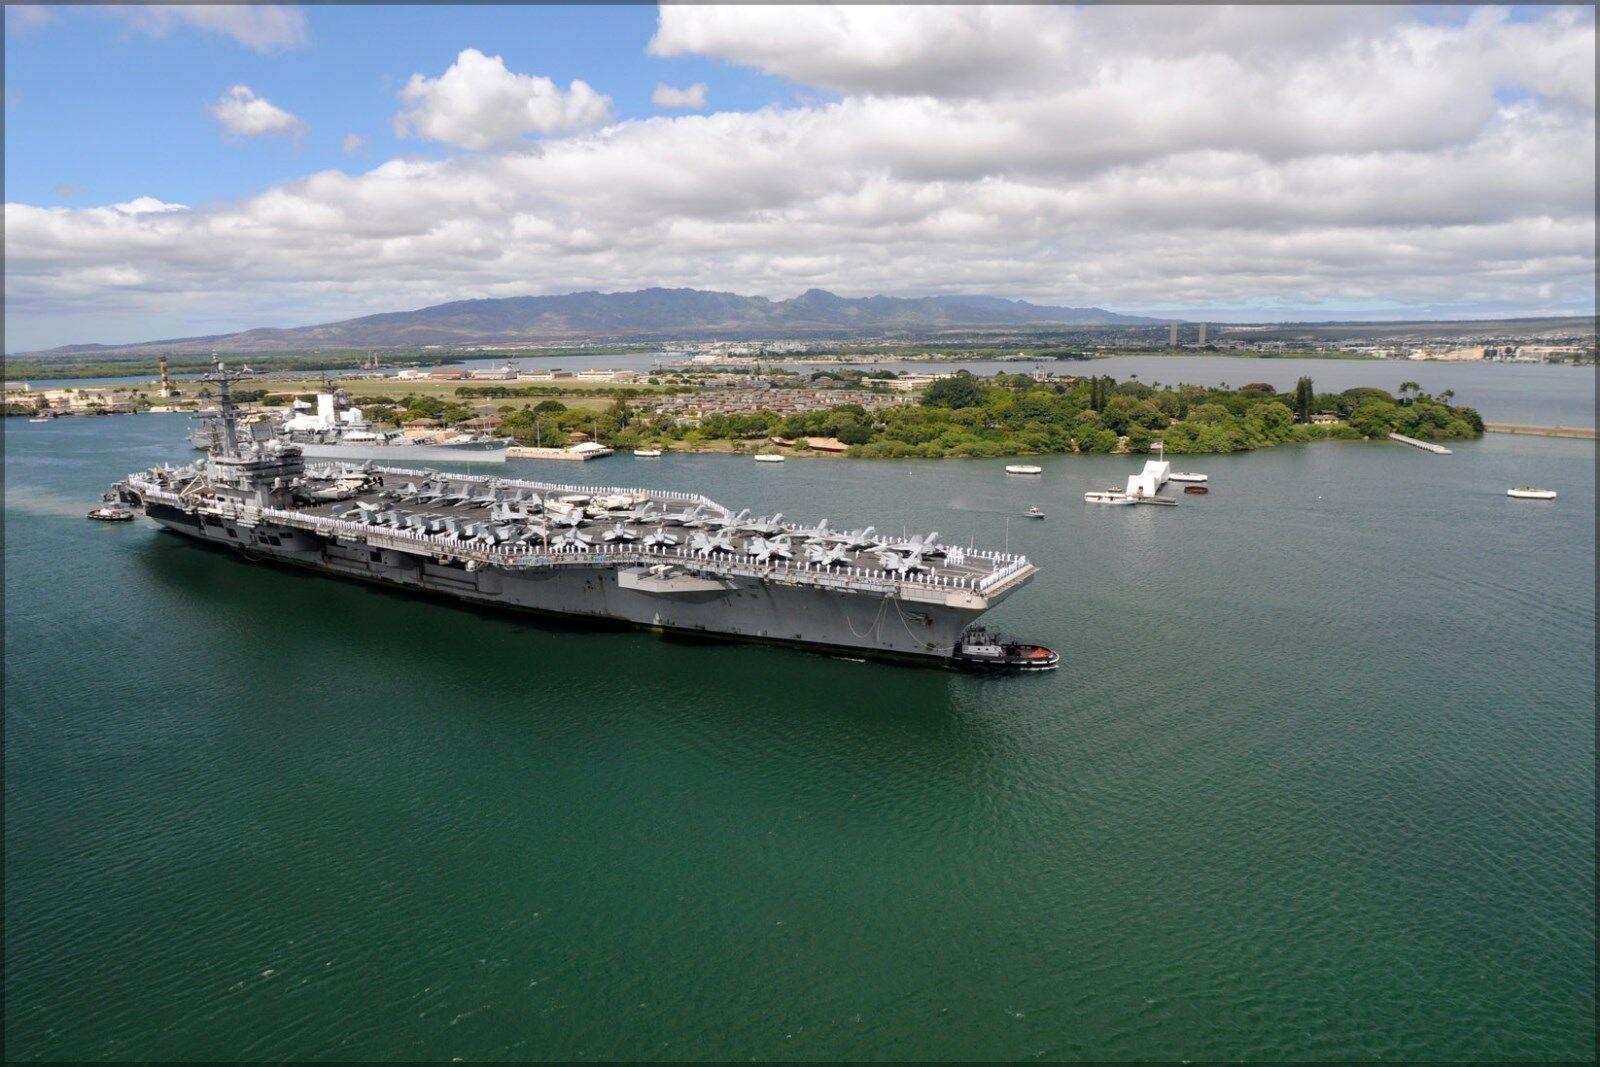 Poster, Many Dimensiones; Uss Arizona Memorial & Uss Ronald Reagan Pearl Harbor, Hawai